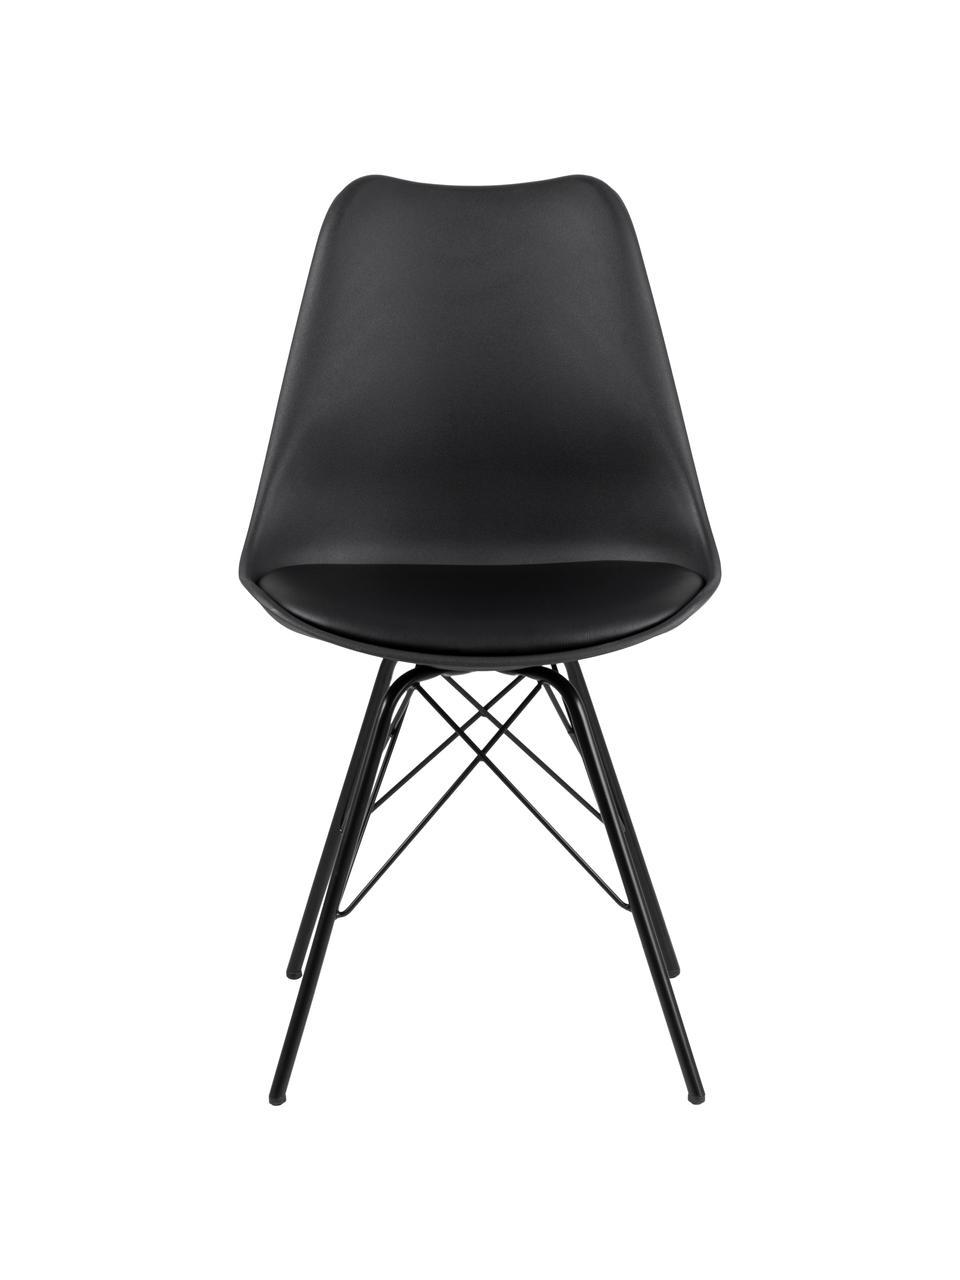 Sedia in materiale sintetico Eris 2 pz, Seduta: similpelle (poliuretano) , Seduta: materiale sintetico, Gambe: metallo verniciato a polv, Nero, Larg. 49 x Prof. 54 cm